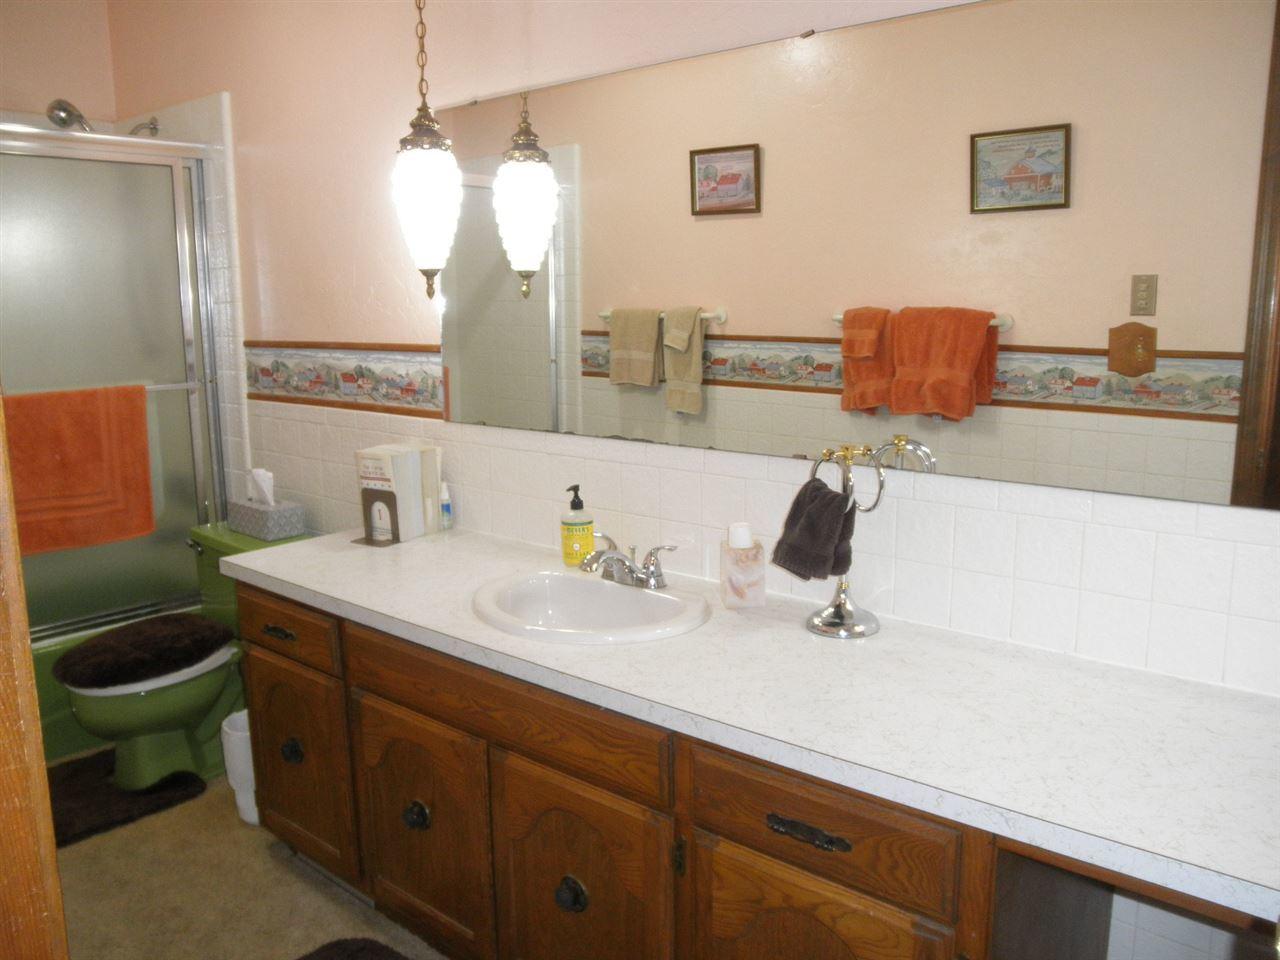 Sold Cross Sale W/ MLS | 1275 S Enterprise Road  Ponca City, OK 74604 14